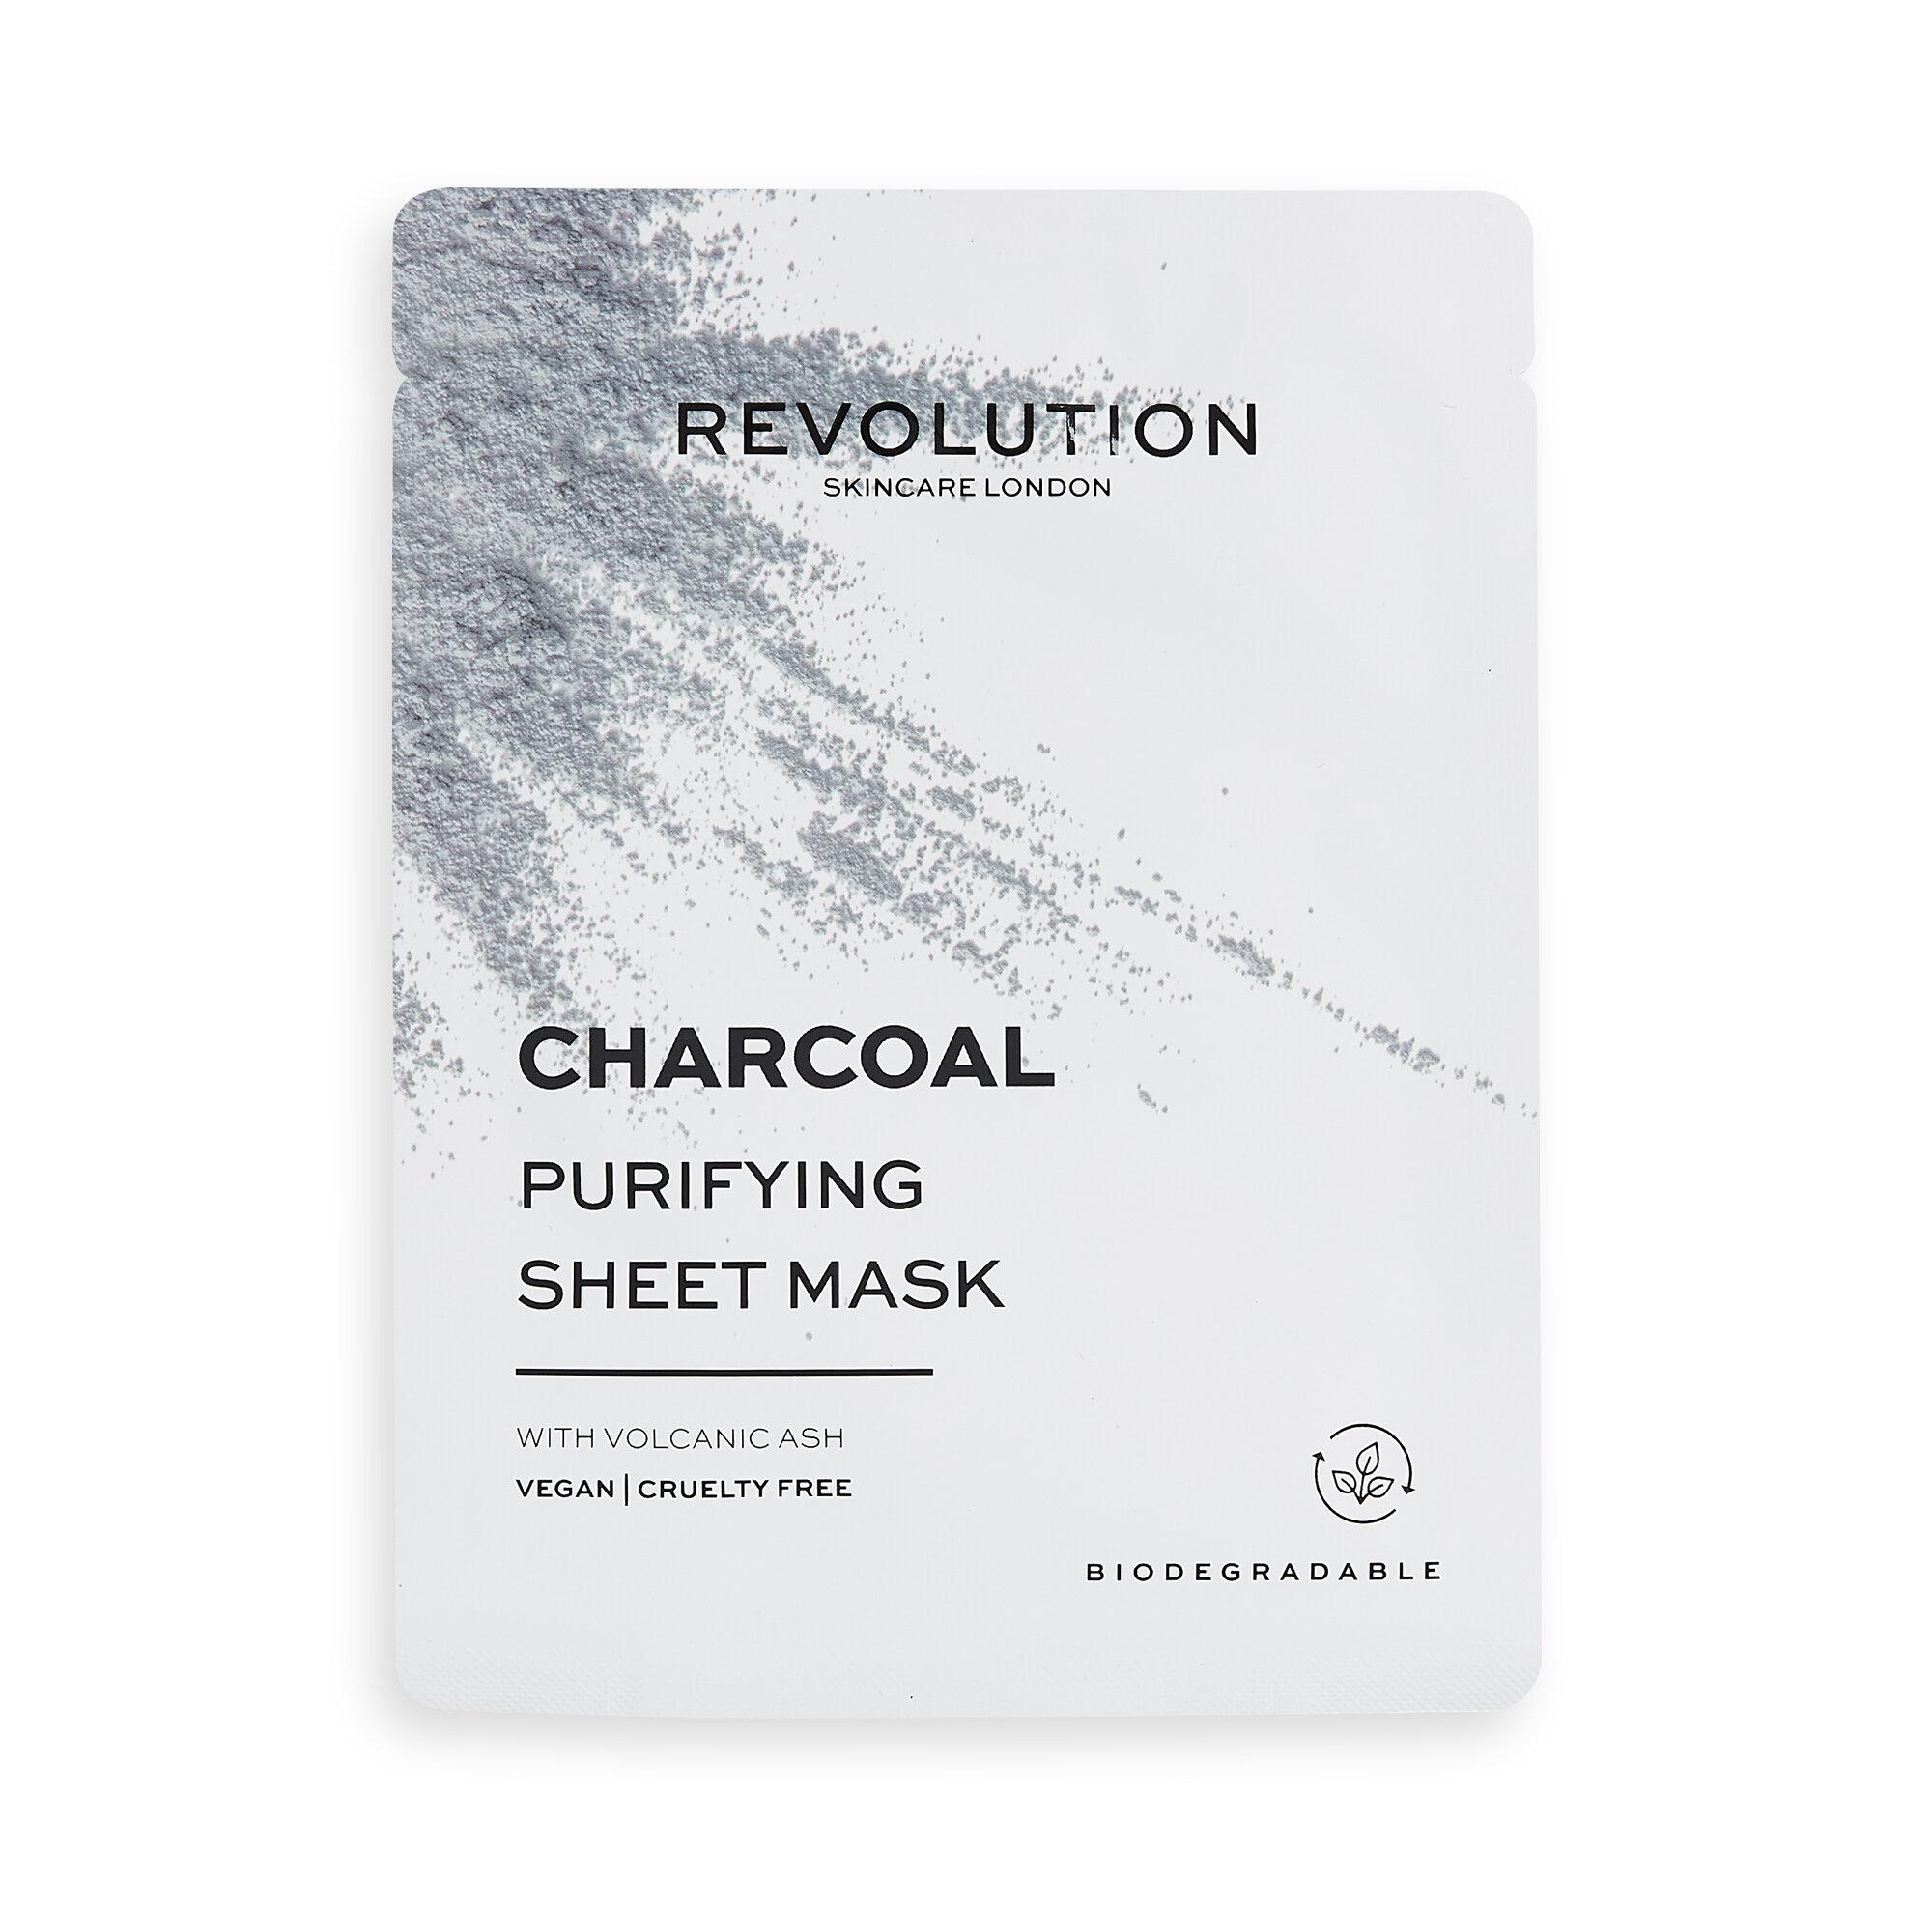 Revolution Skincare Charcoal Purifying Sheet Mask